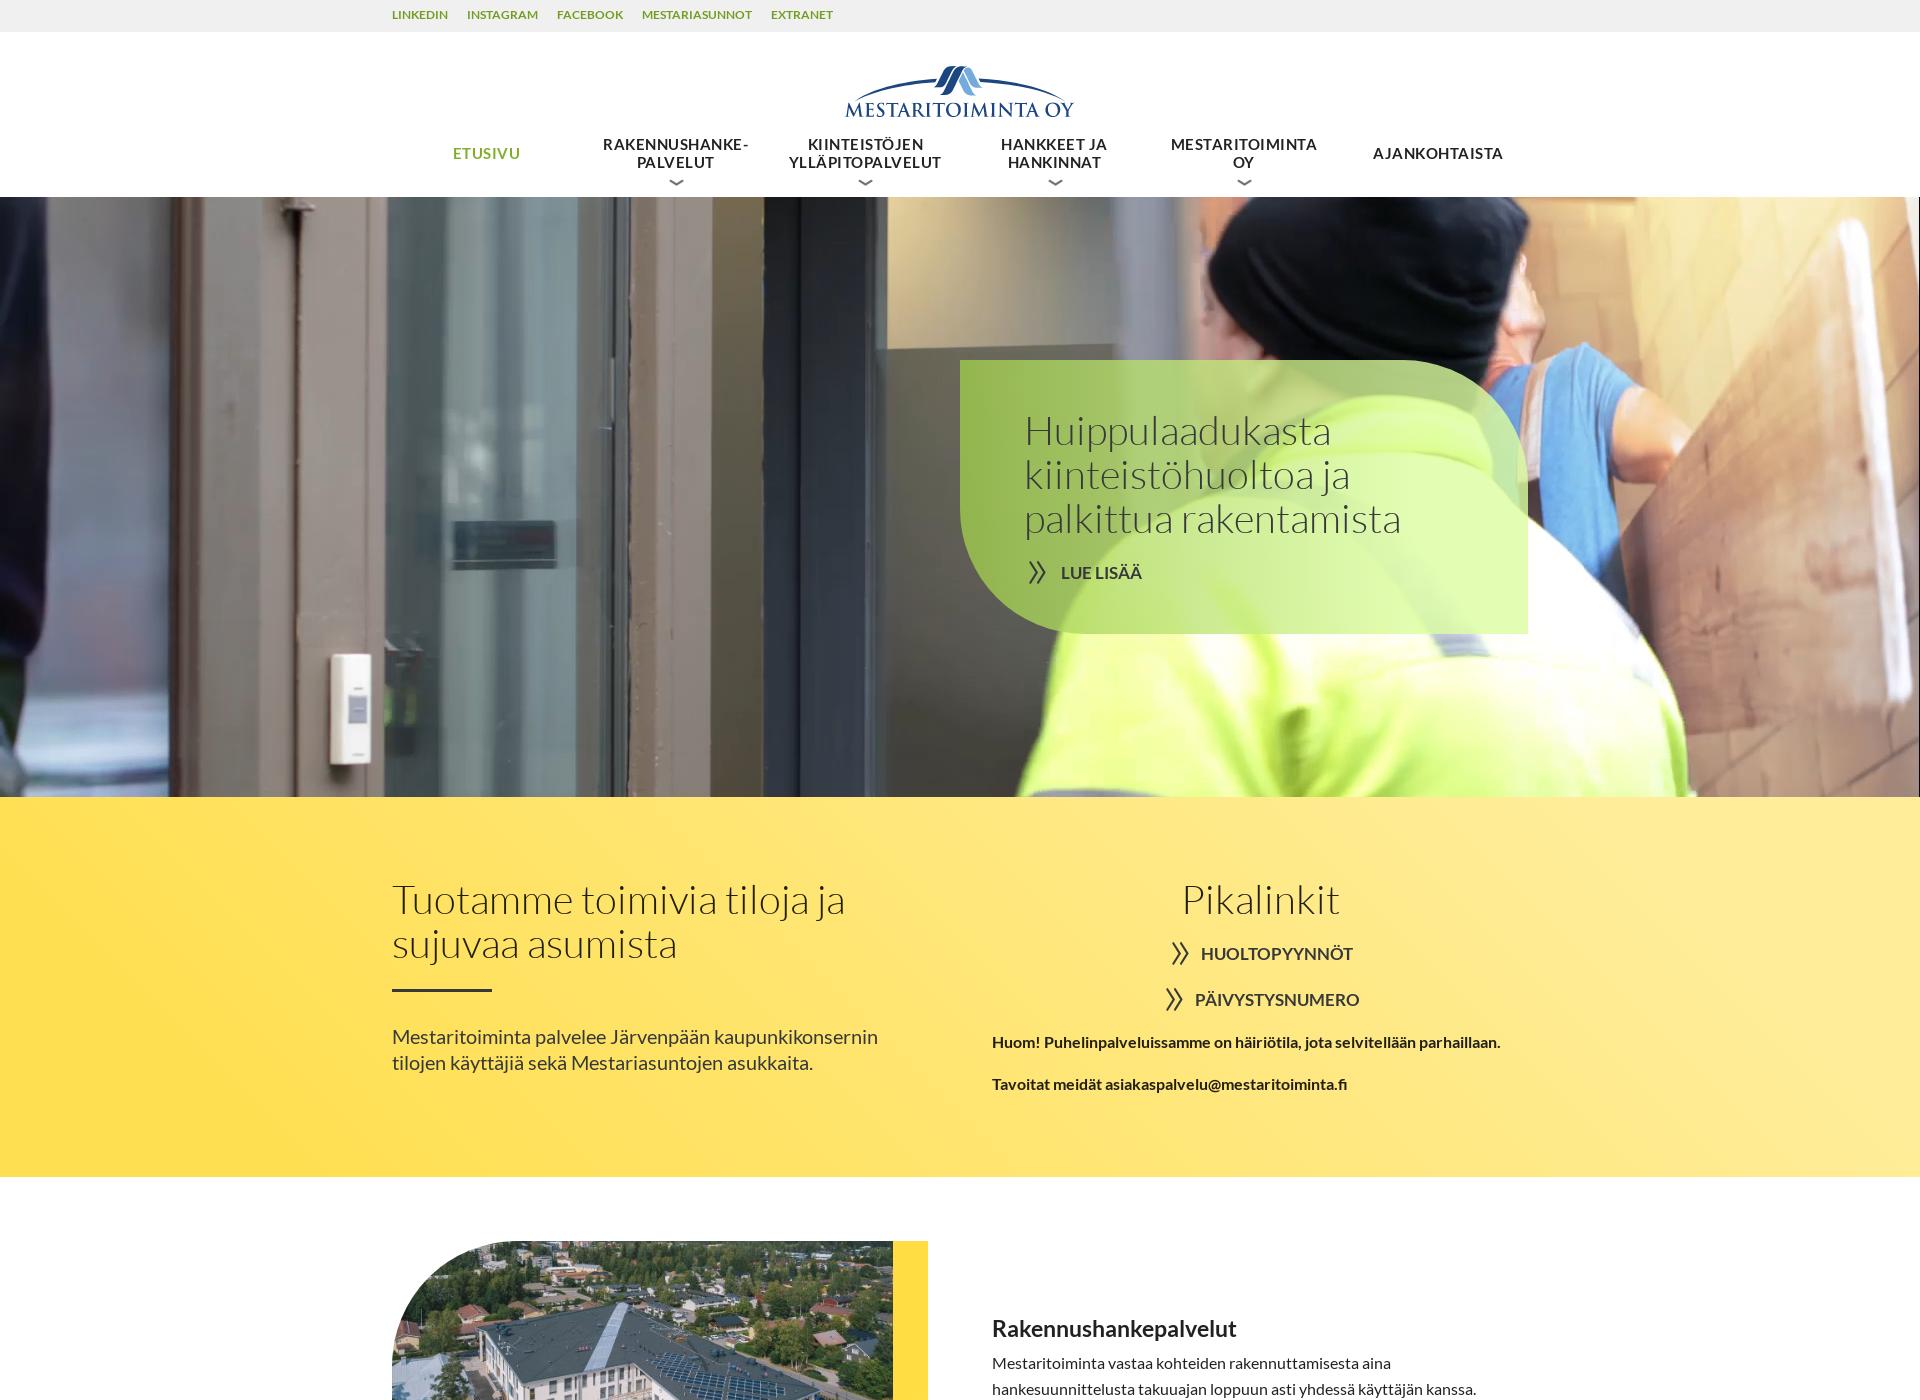 Screenshot for mestaritoiminta.fi